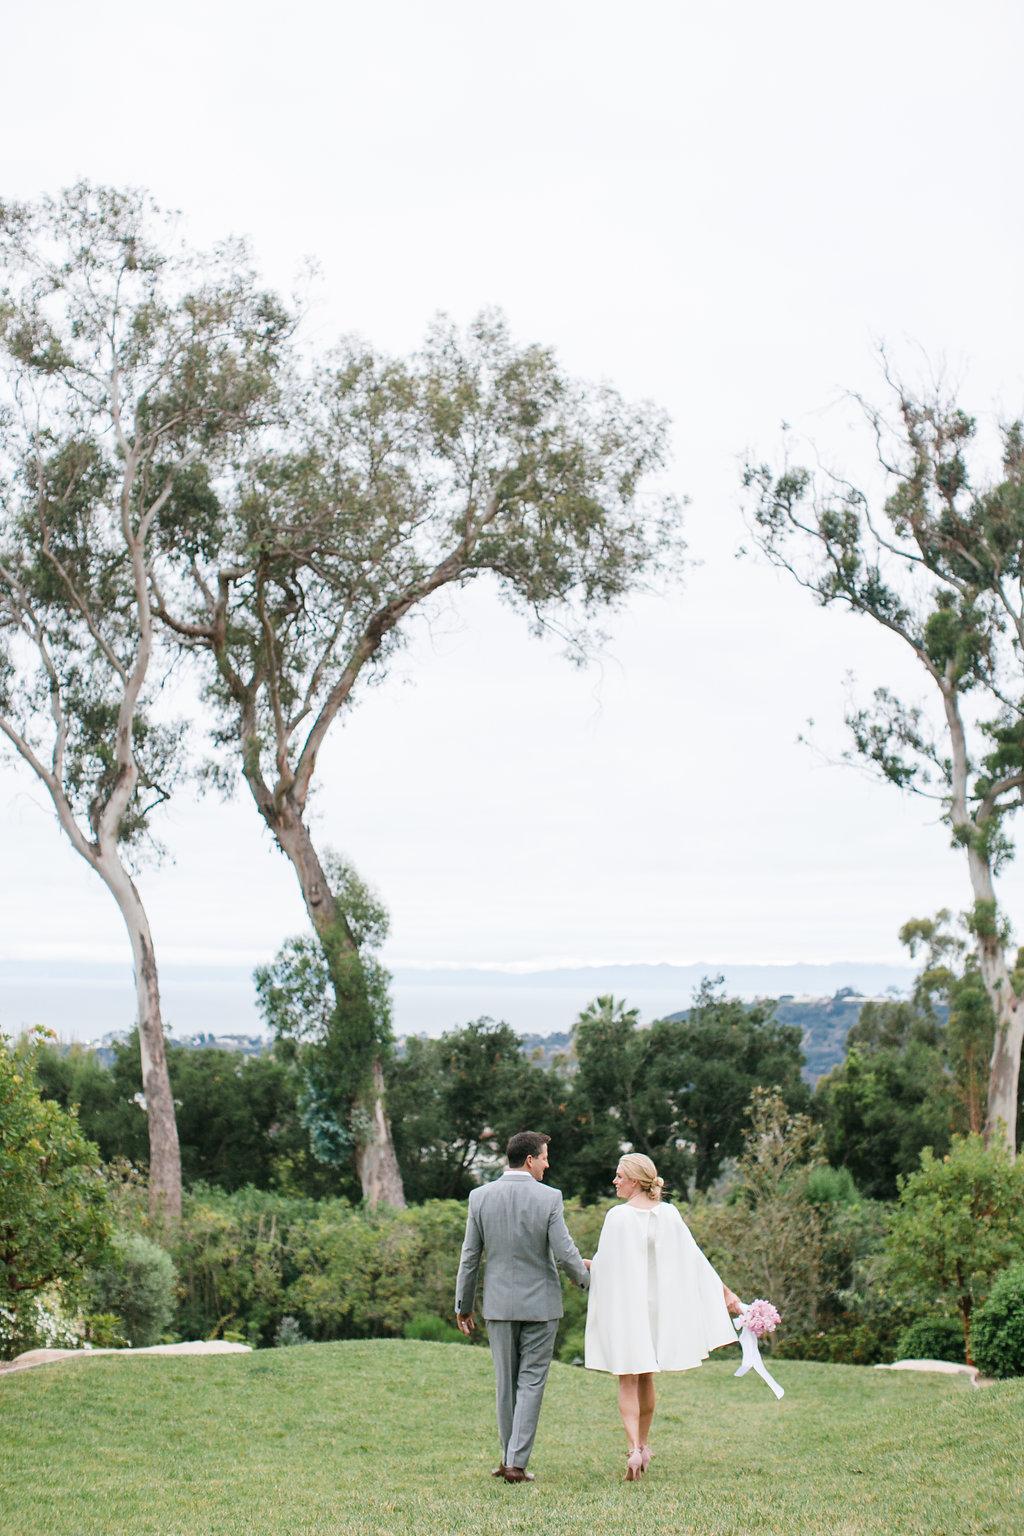 santa-barbara-elopement-wedding-planning-planner-coordinator-day-of-week-small-wedding-el-encanto-lily-pond-pink-kids-garden-riviera-elope-design-estate-candle (1).jpg